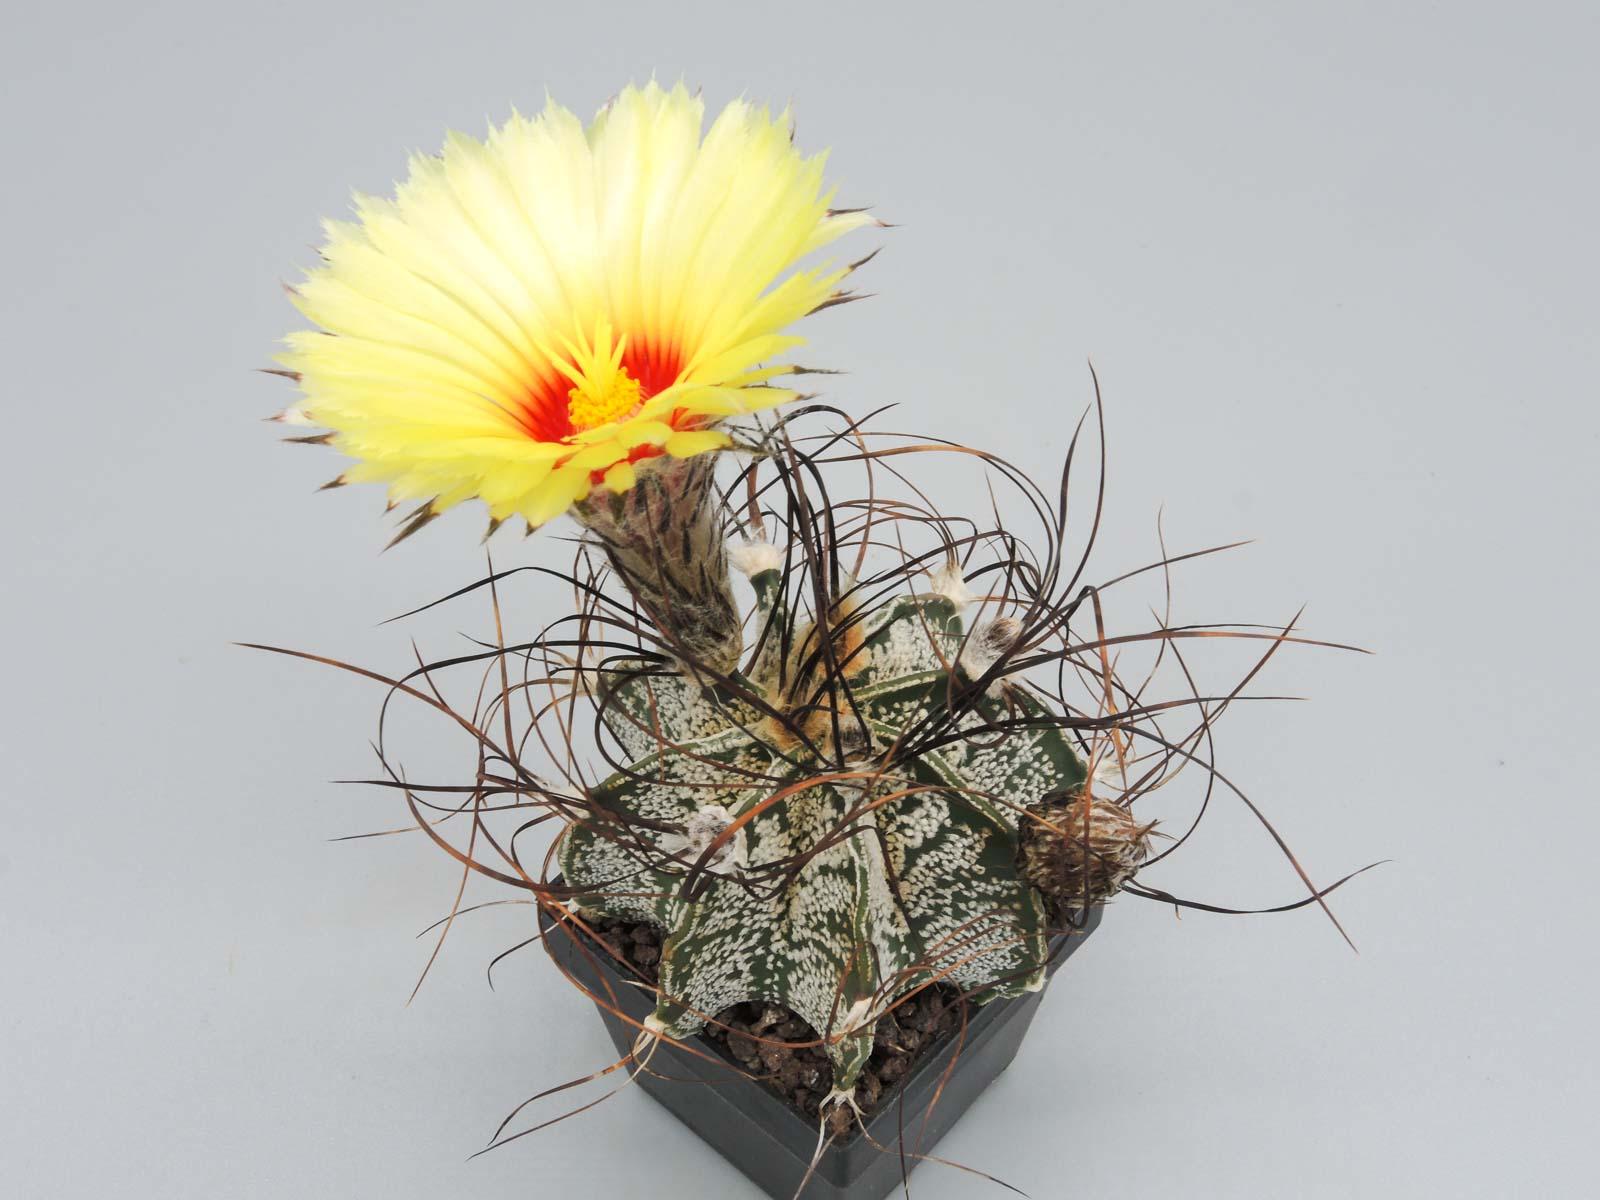 Astrophytum capricorne Hipolito